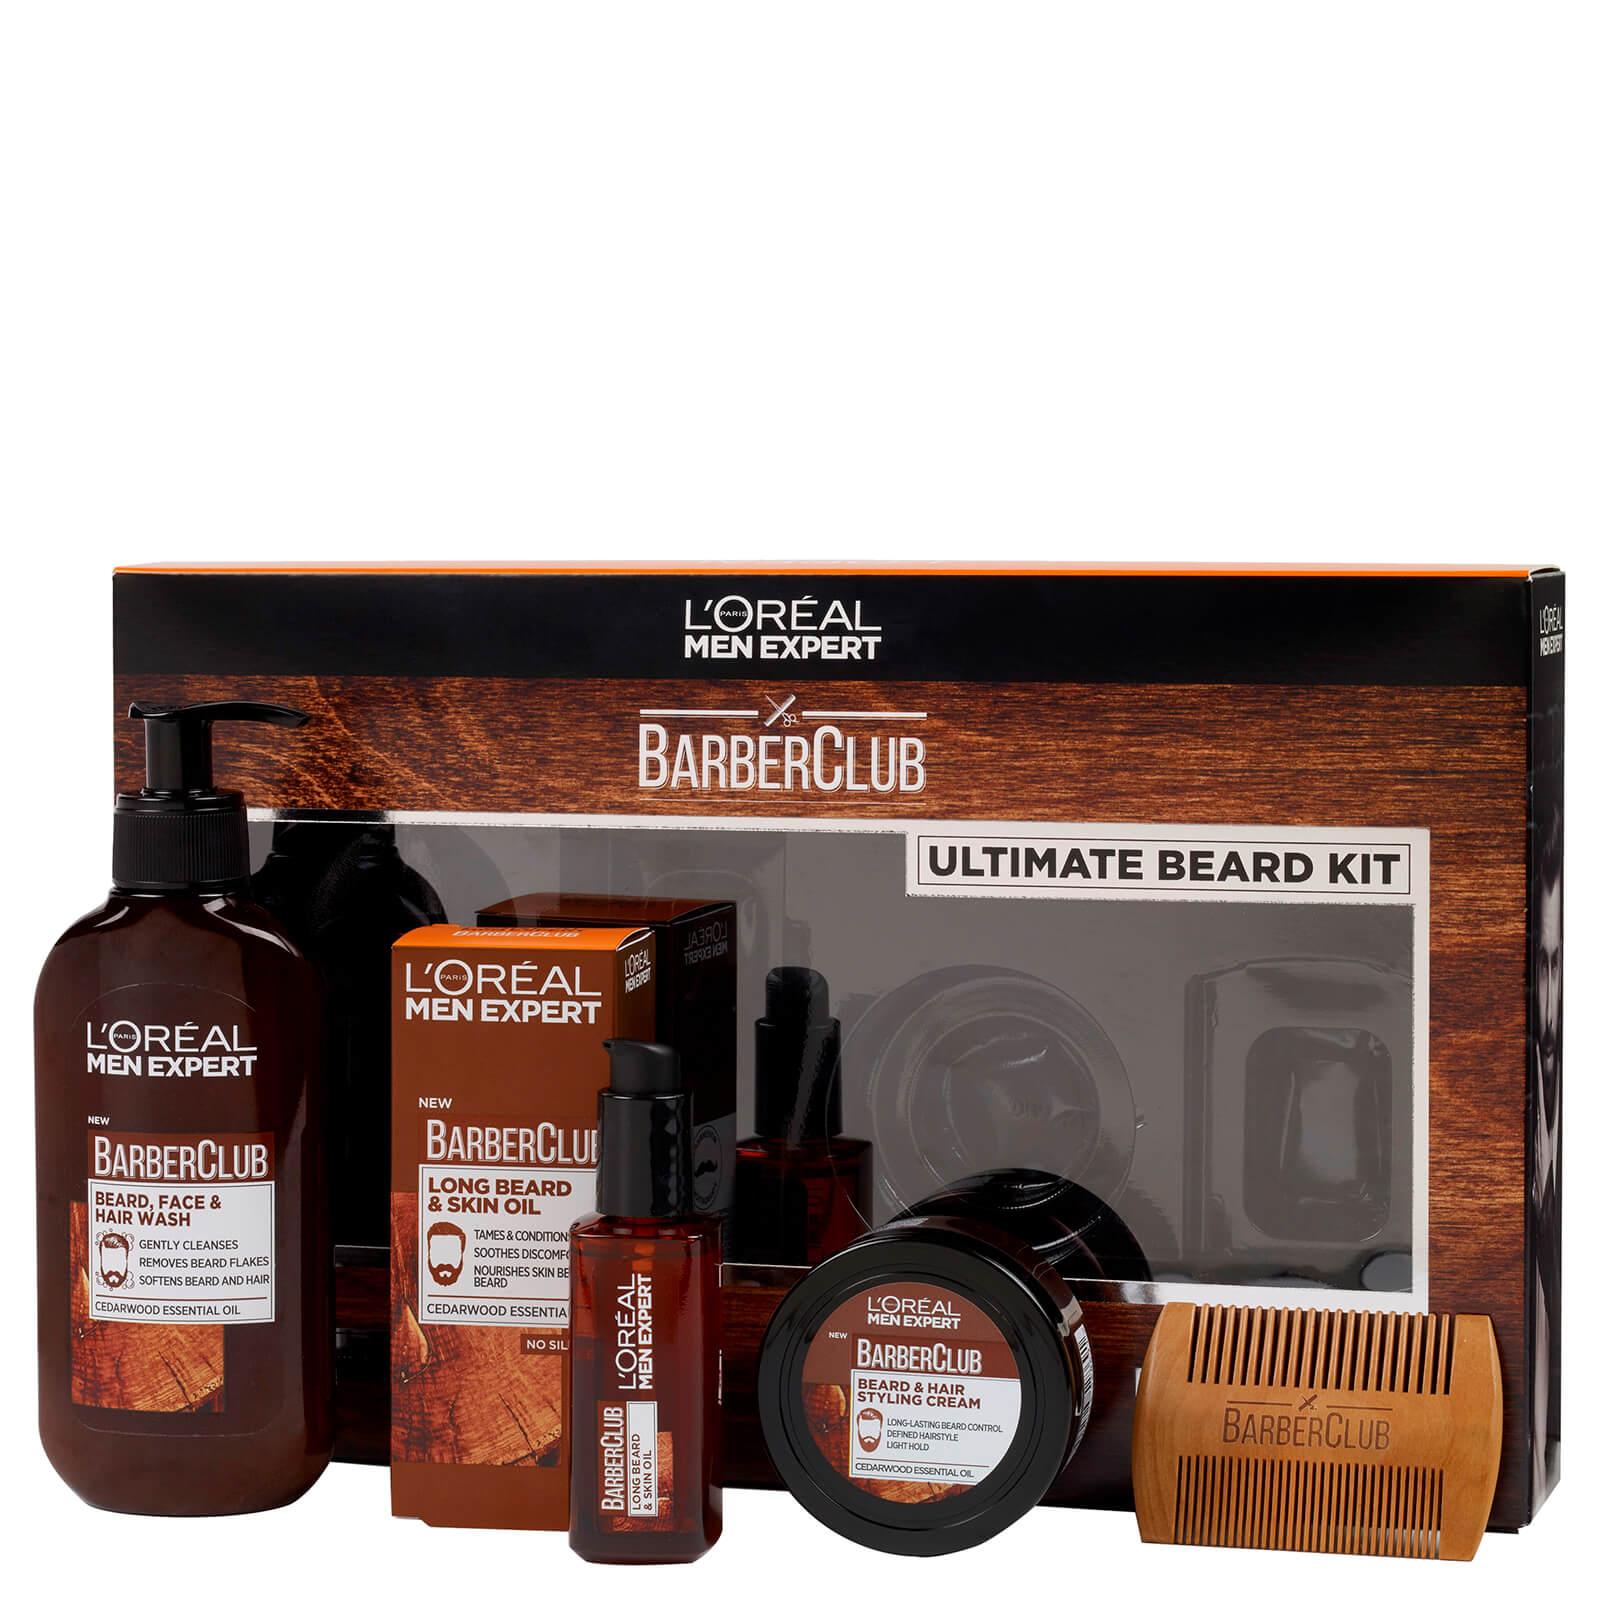 L'oreal men expert barber club kit - £6.25 @ Sainsbury's